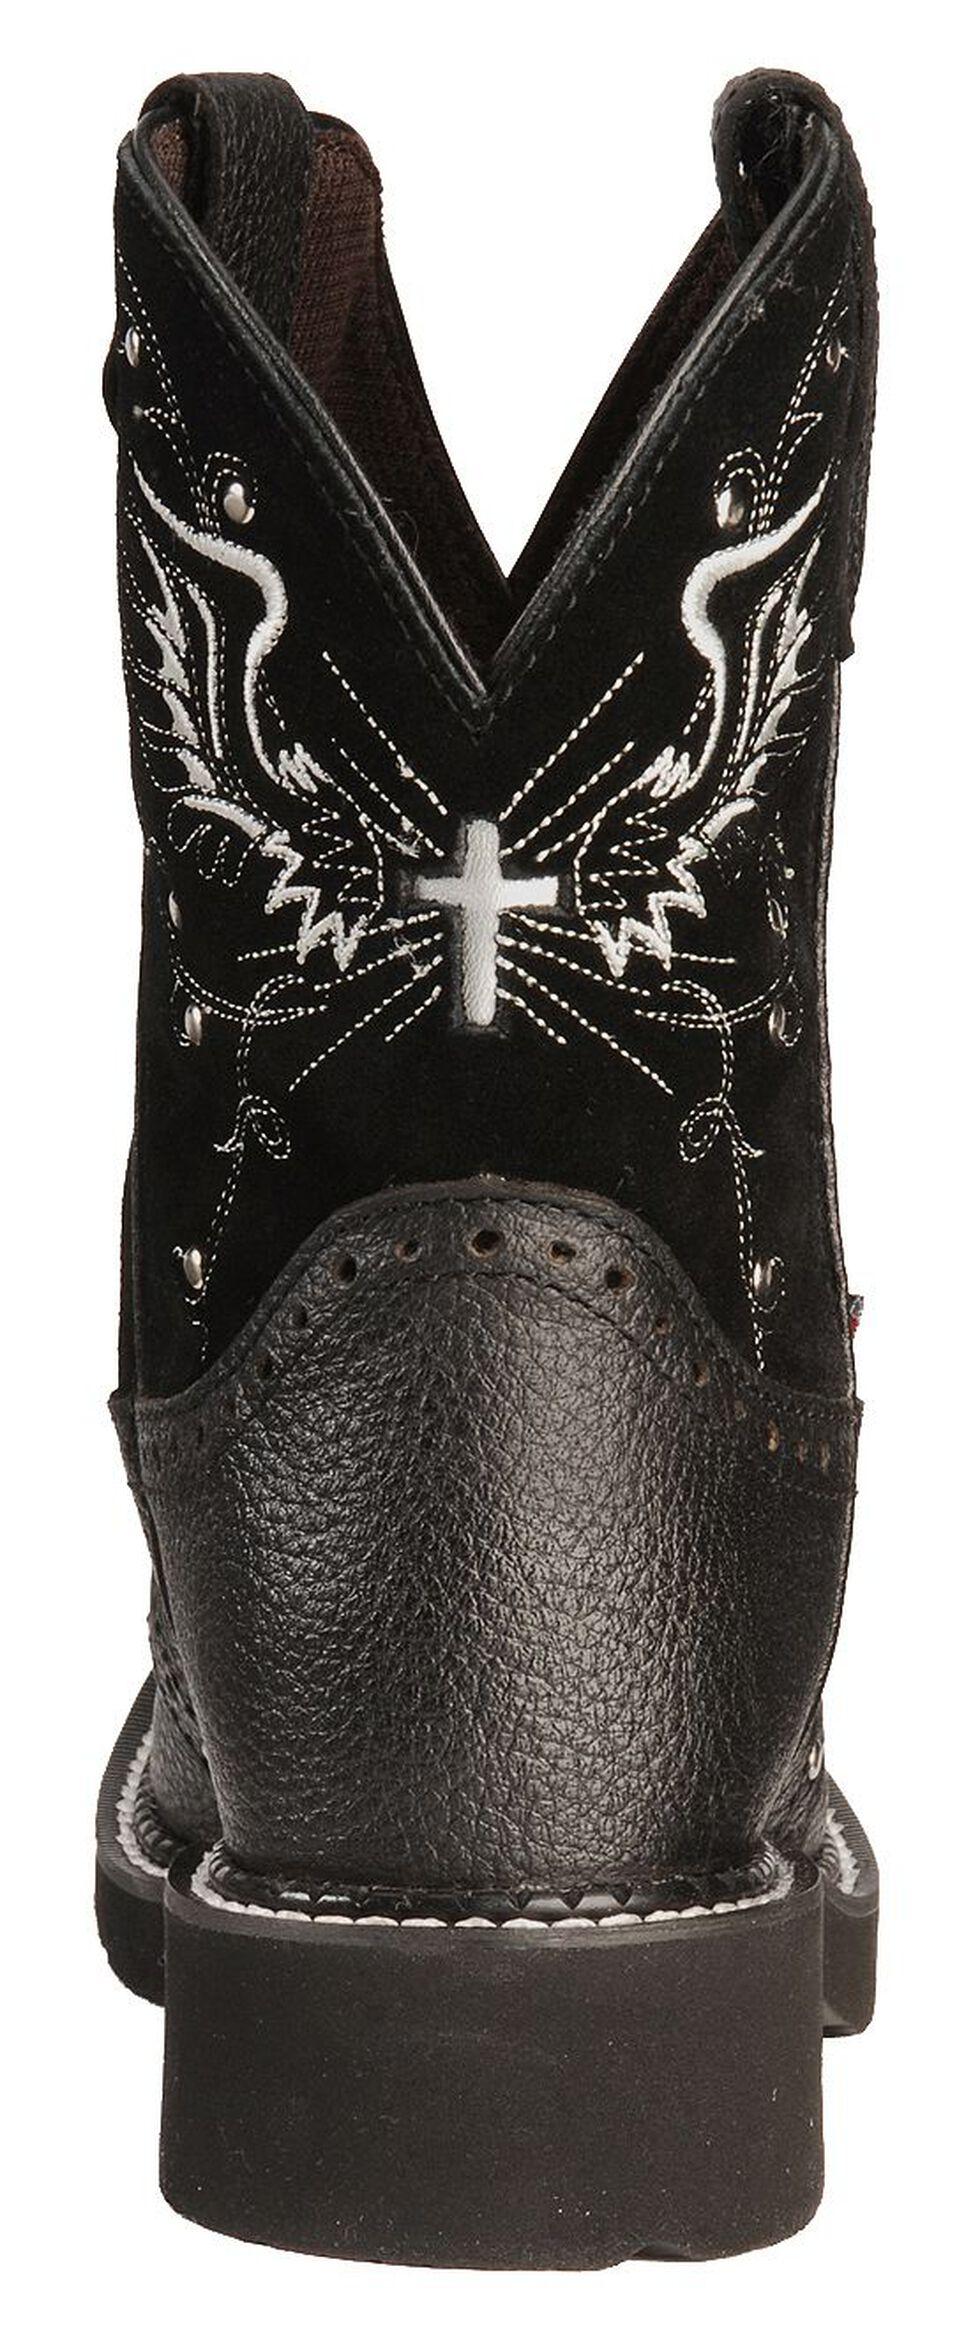 Justin Gypsy Women's Mandra Black Cowgirl Boots - Square Toe, Black, hi-res